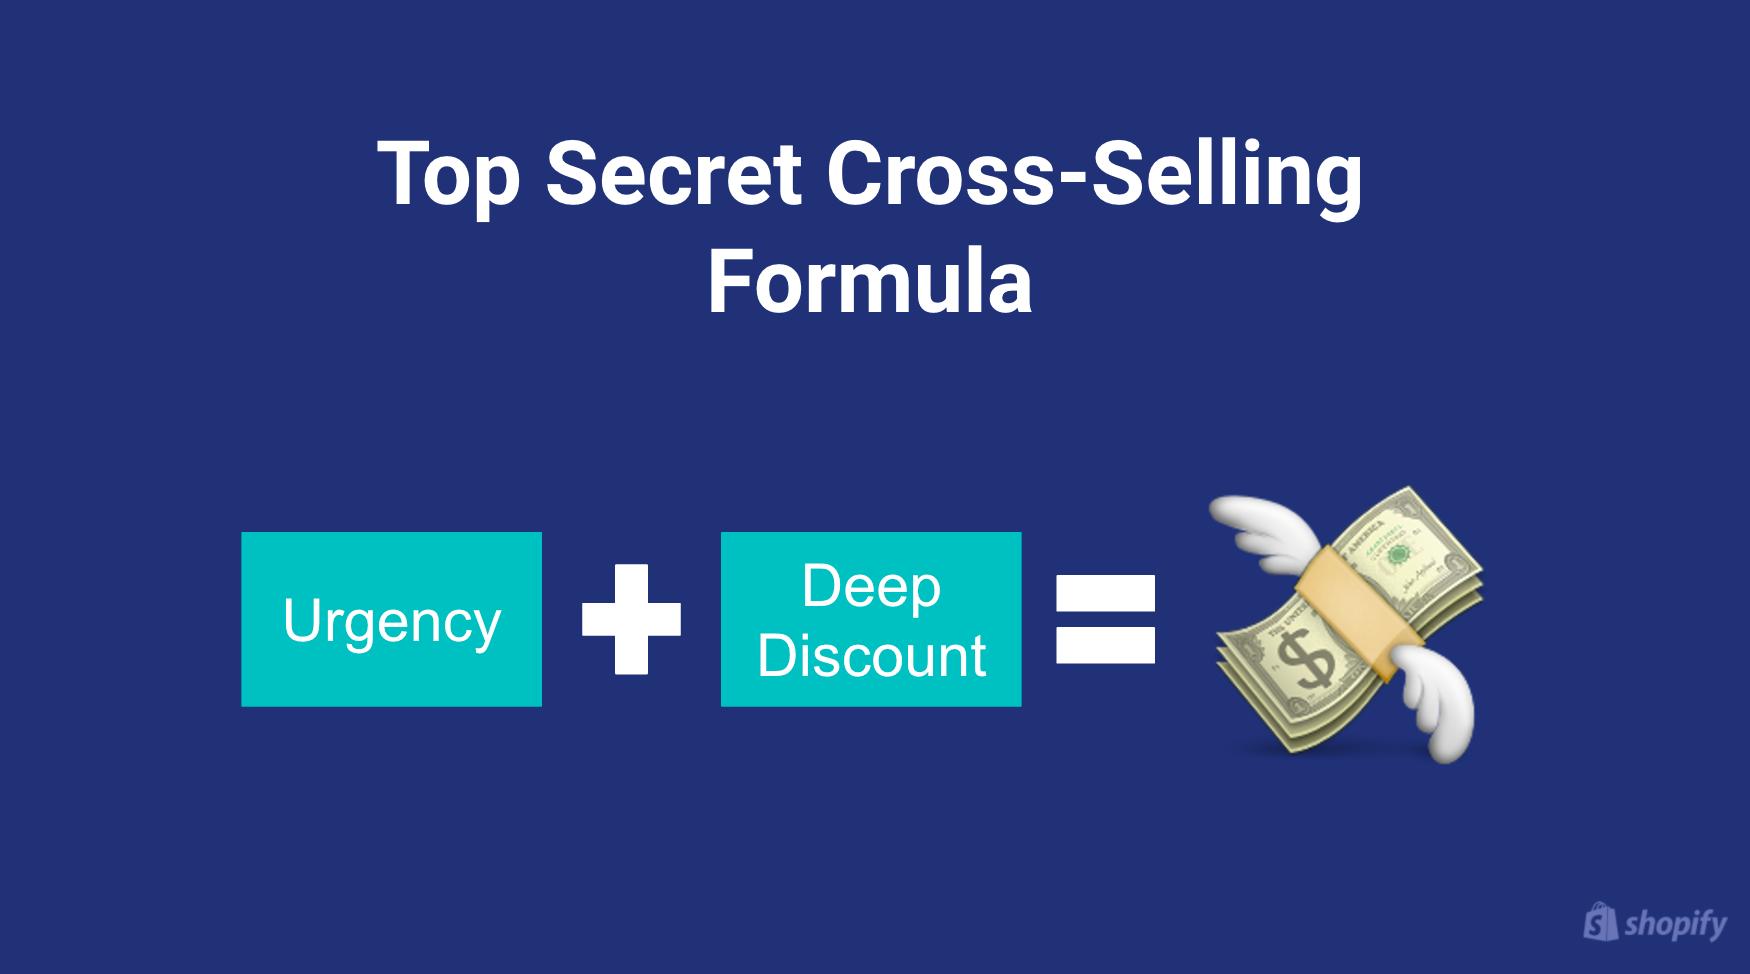 Top secret cross-selling formula